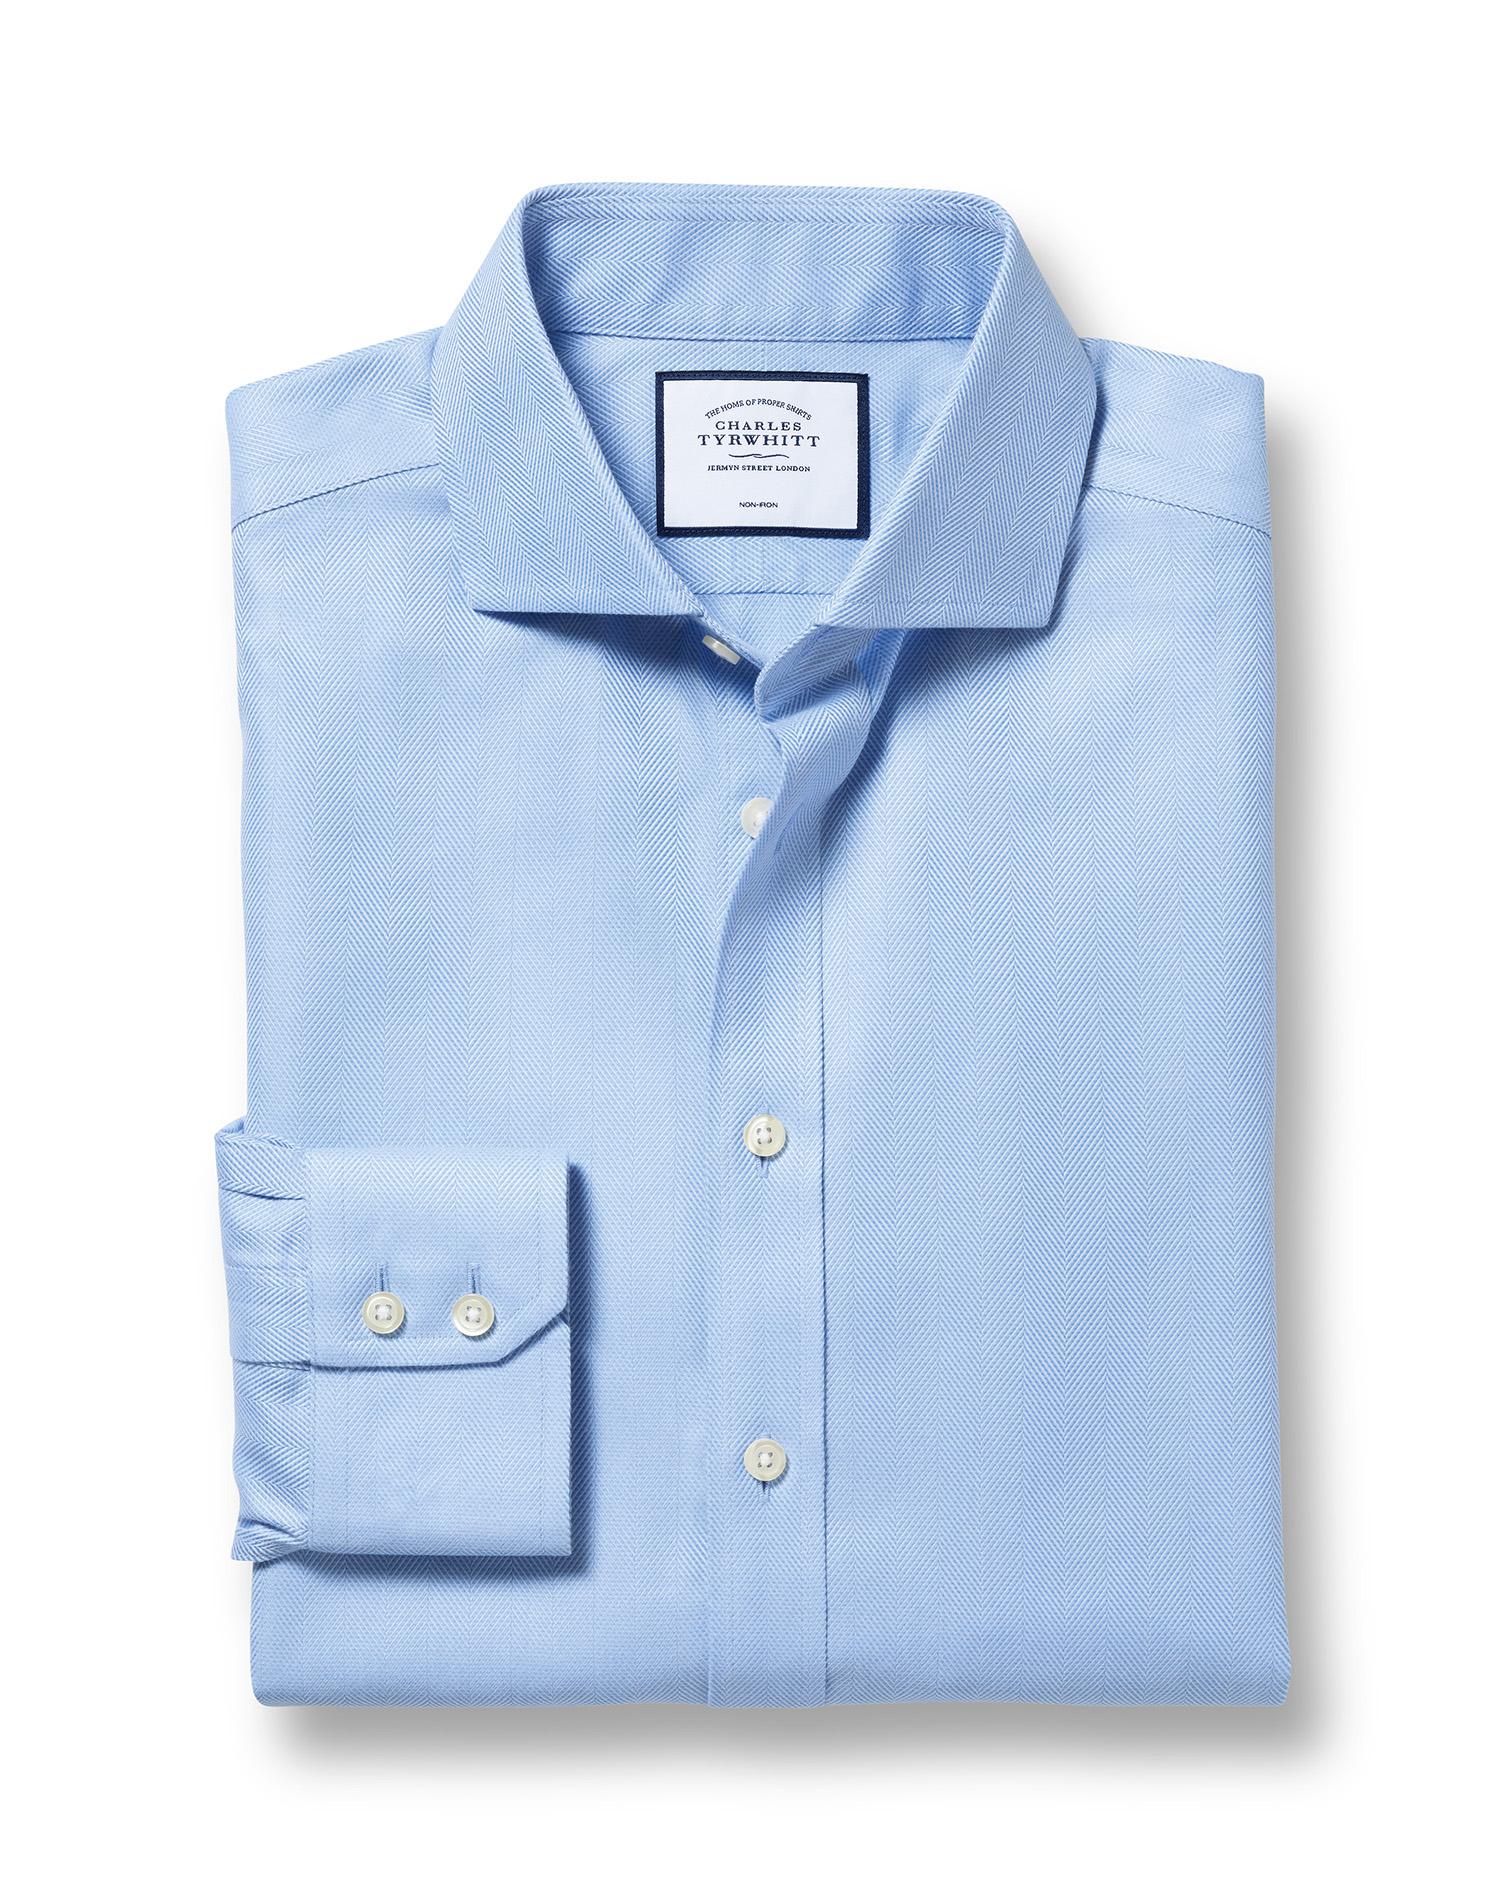 Slim Fit Cutaway Non-Iron Herringbone Sky Blue Cotton Formal Shirt Single Cuff Size 16.5/36 by Charl